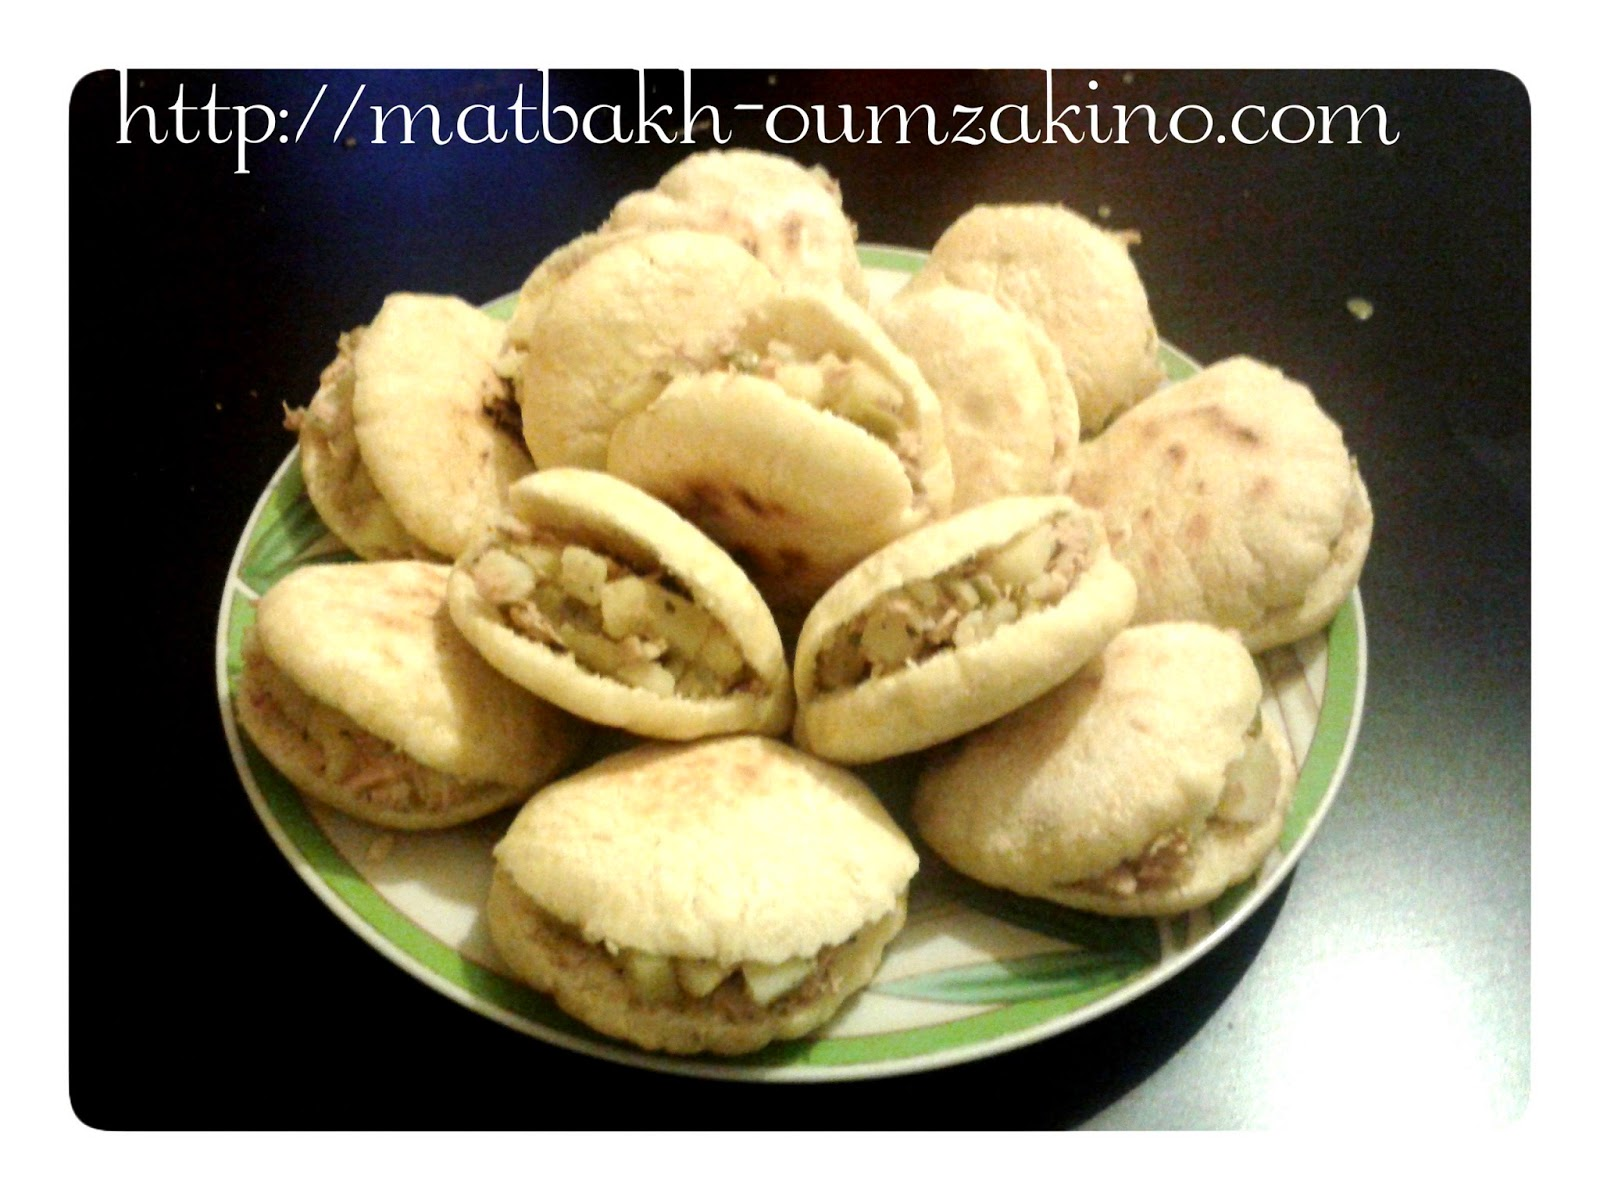 mini batbout pomme de terre thon olive matbakh oumzakino